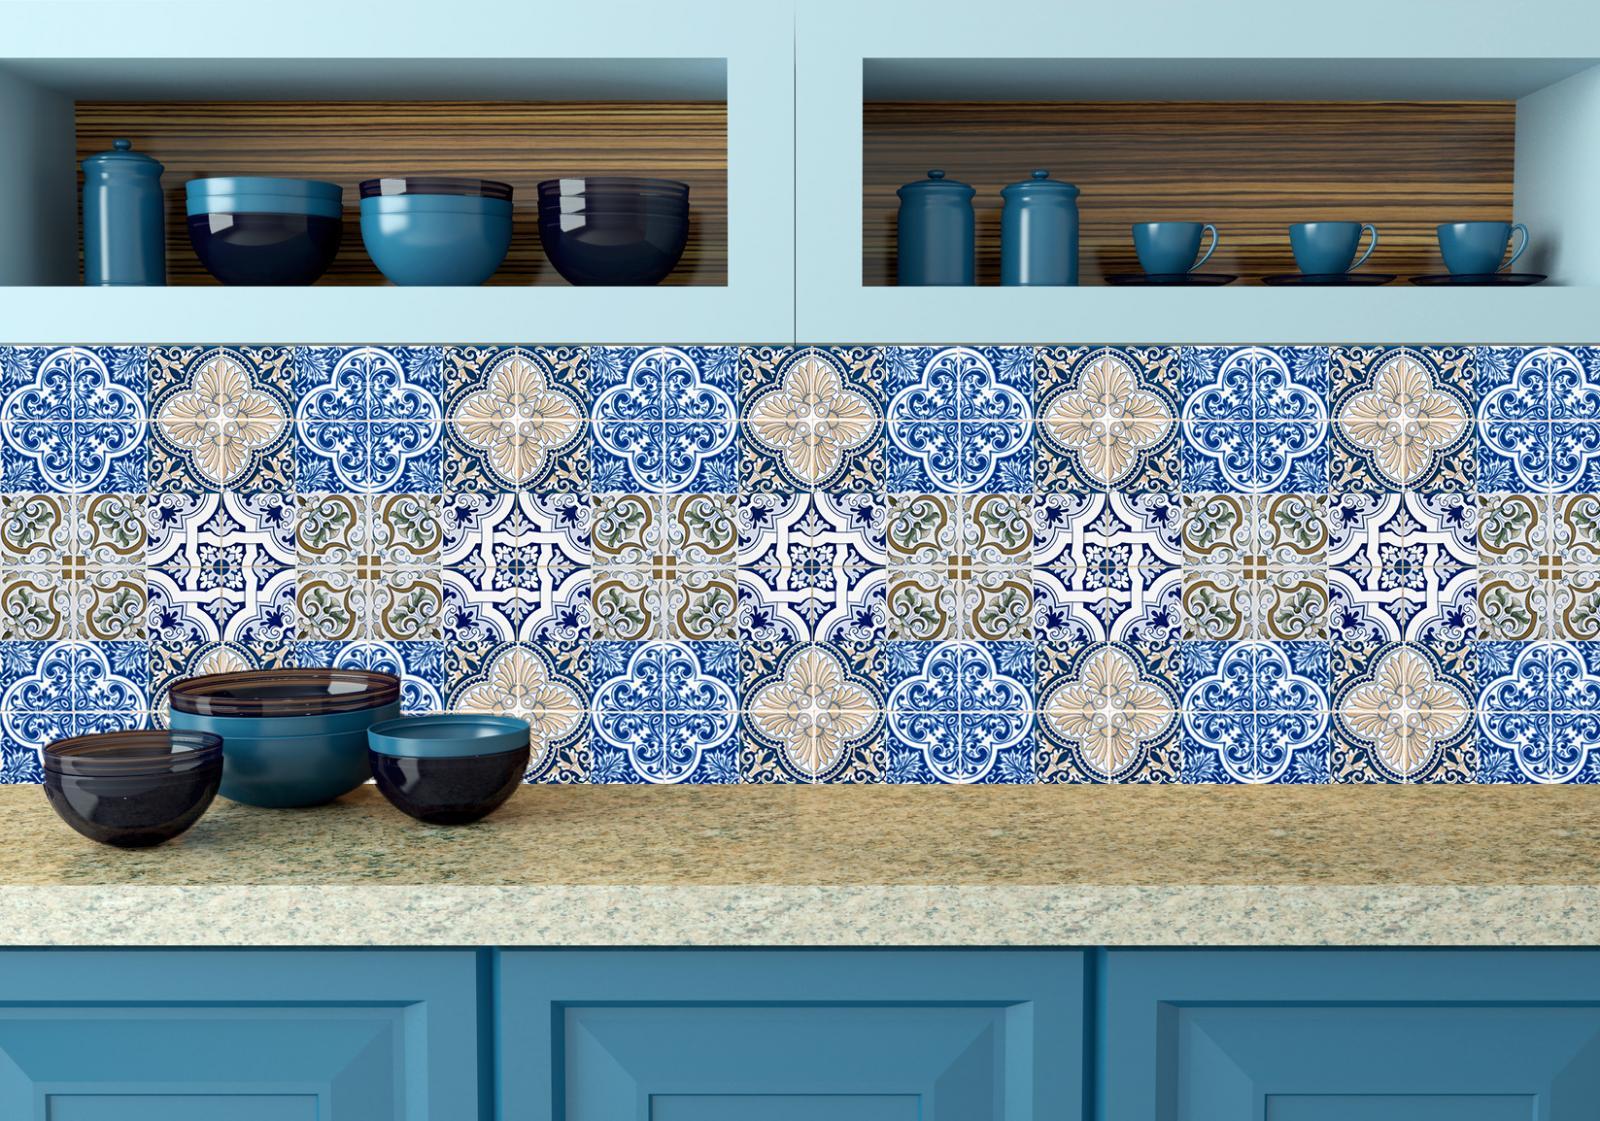 Portuguese Tile Stickers 24 PC Set of Tile Decals Kitchen & Bathroom ...